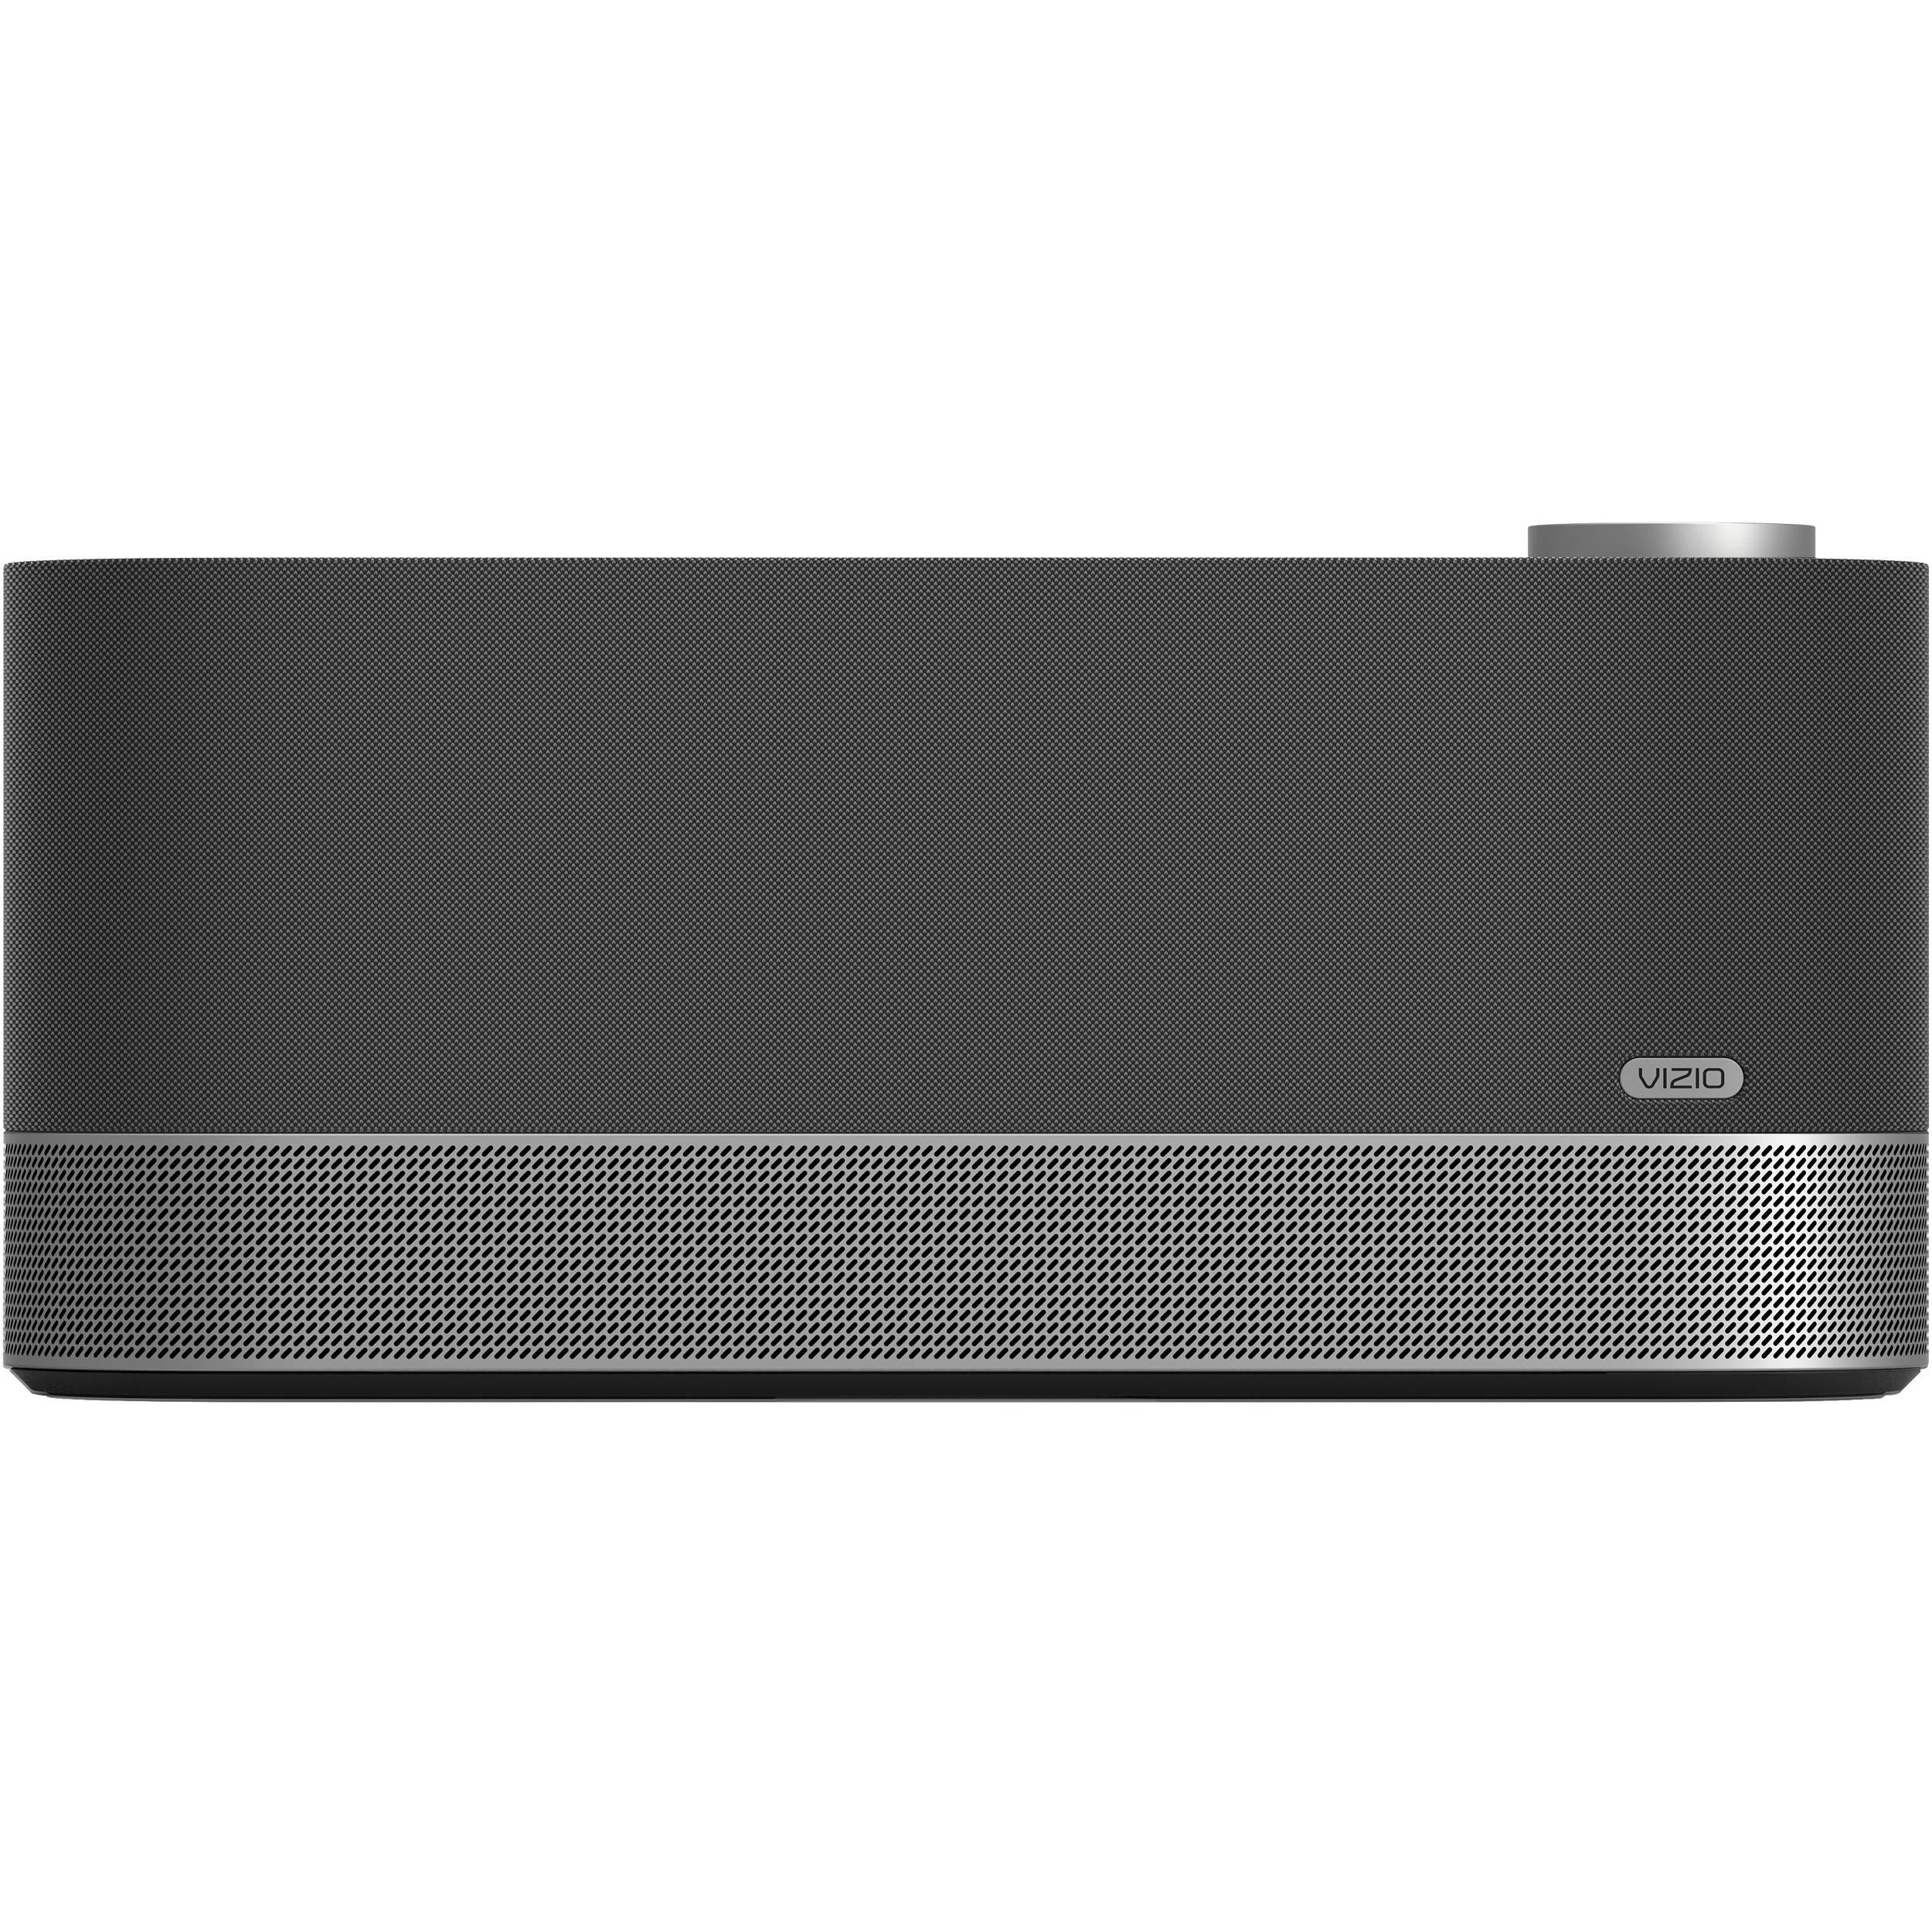 VIZIO SP70-D5 SmartCast Crave Pro Wireless Speaker